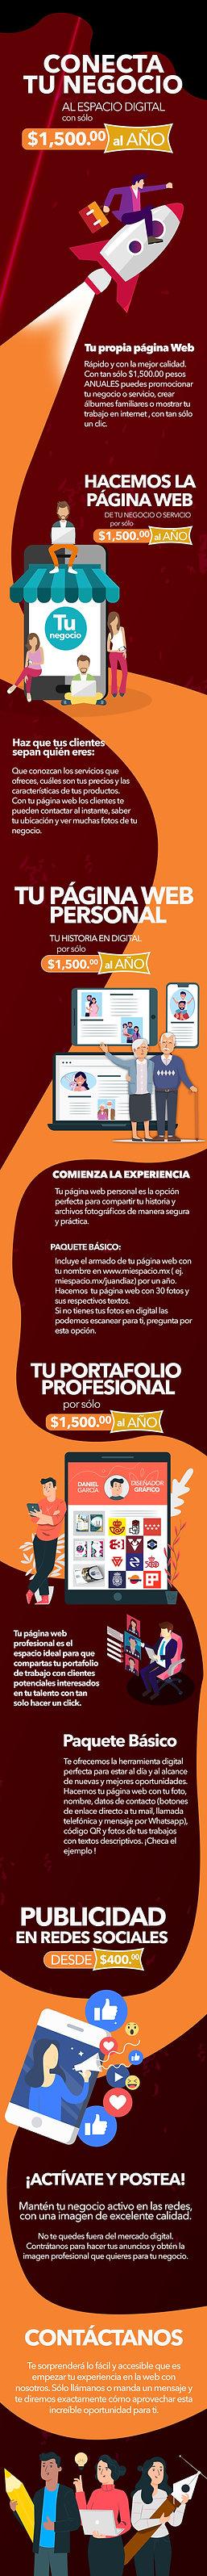 fondoCel02.jpg